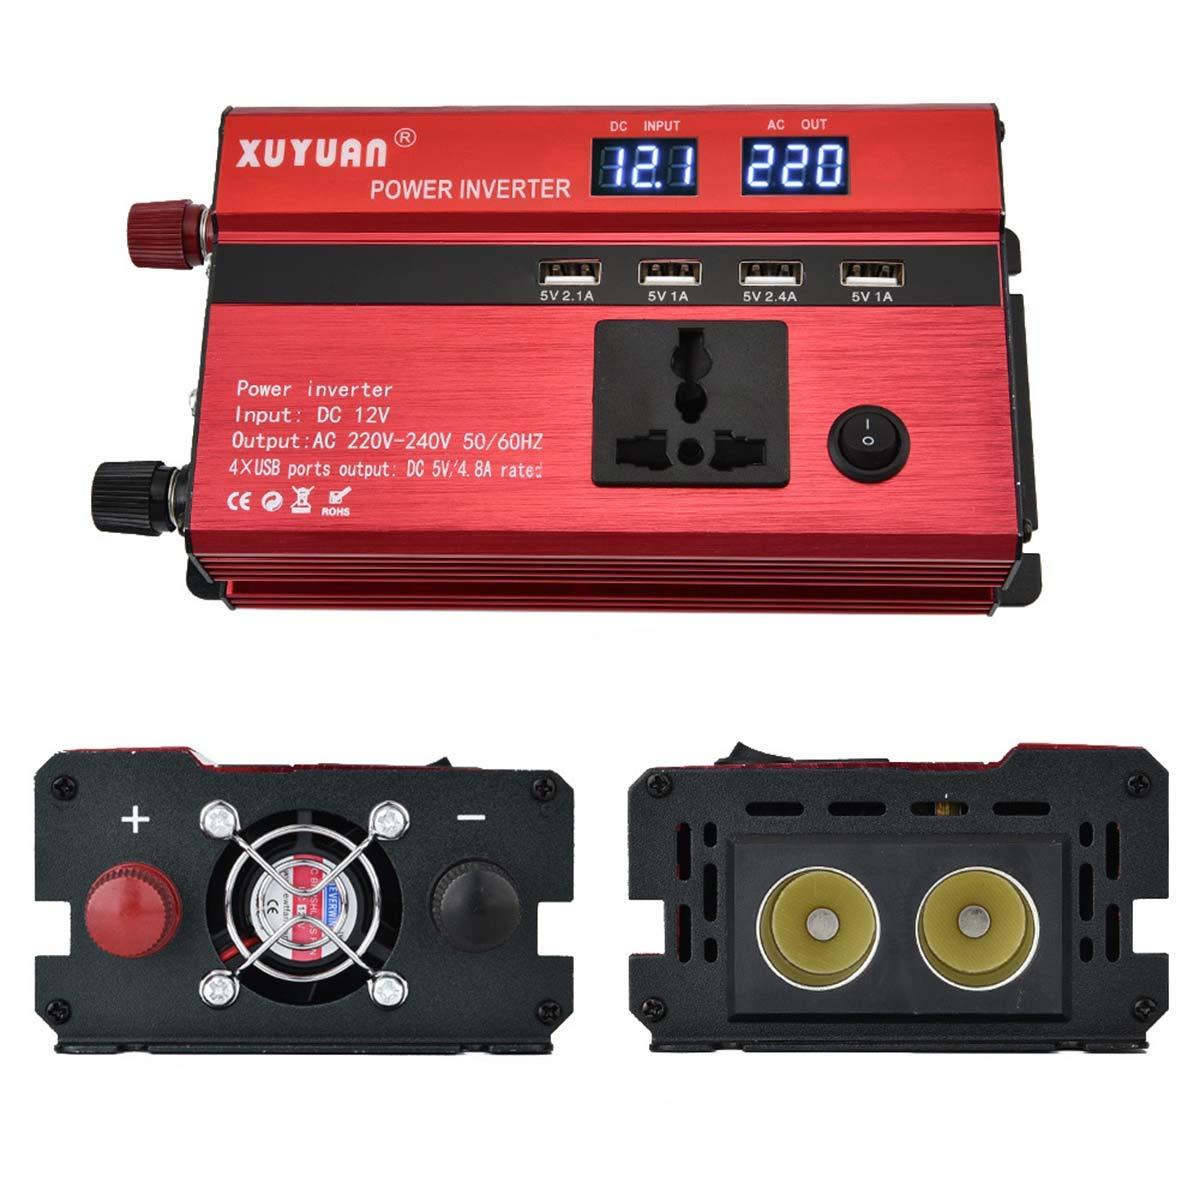 DEALPEAK 3000W/4000W/5000W Car Power Inverter DC 12V To AC 110V/220V Sine Wave Converter with Digital Display 4 USB Ports (Style : 220v/3000W)